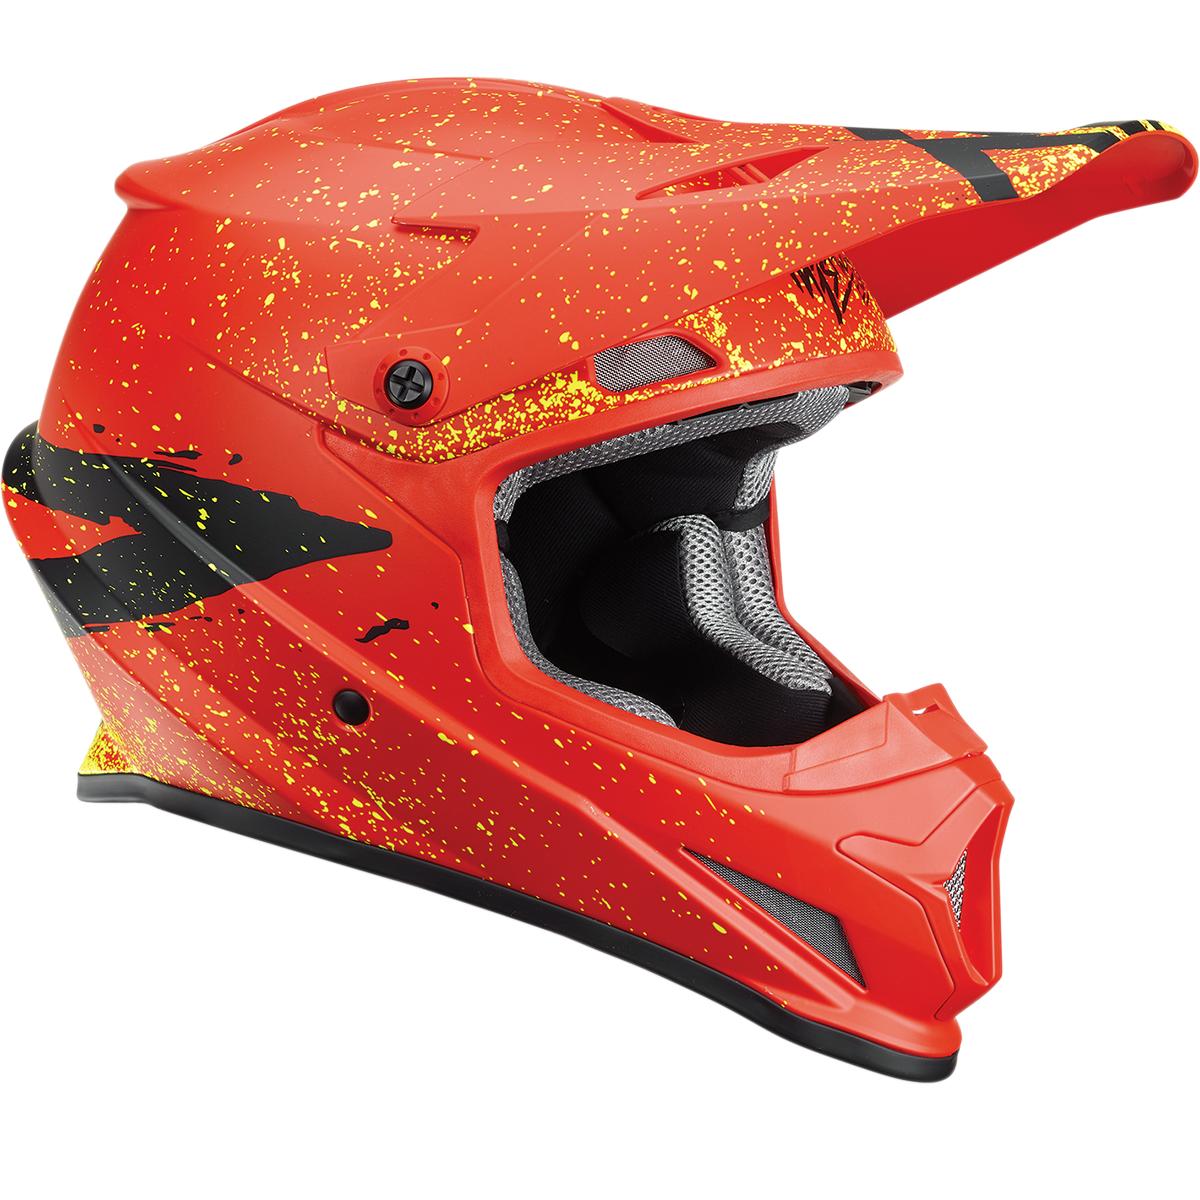 Thor 0110-5490 Sector Hype Helmet